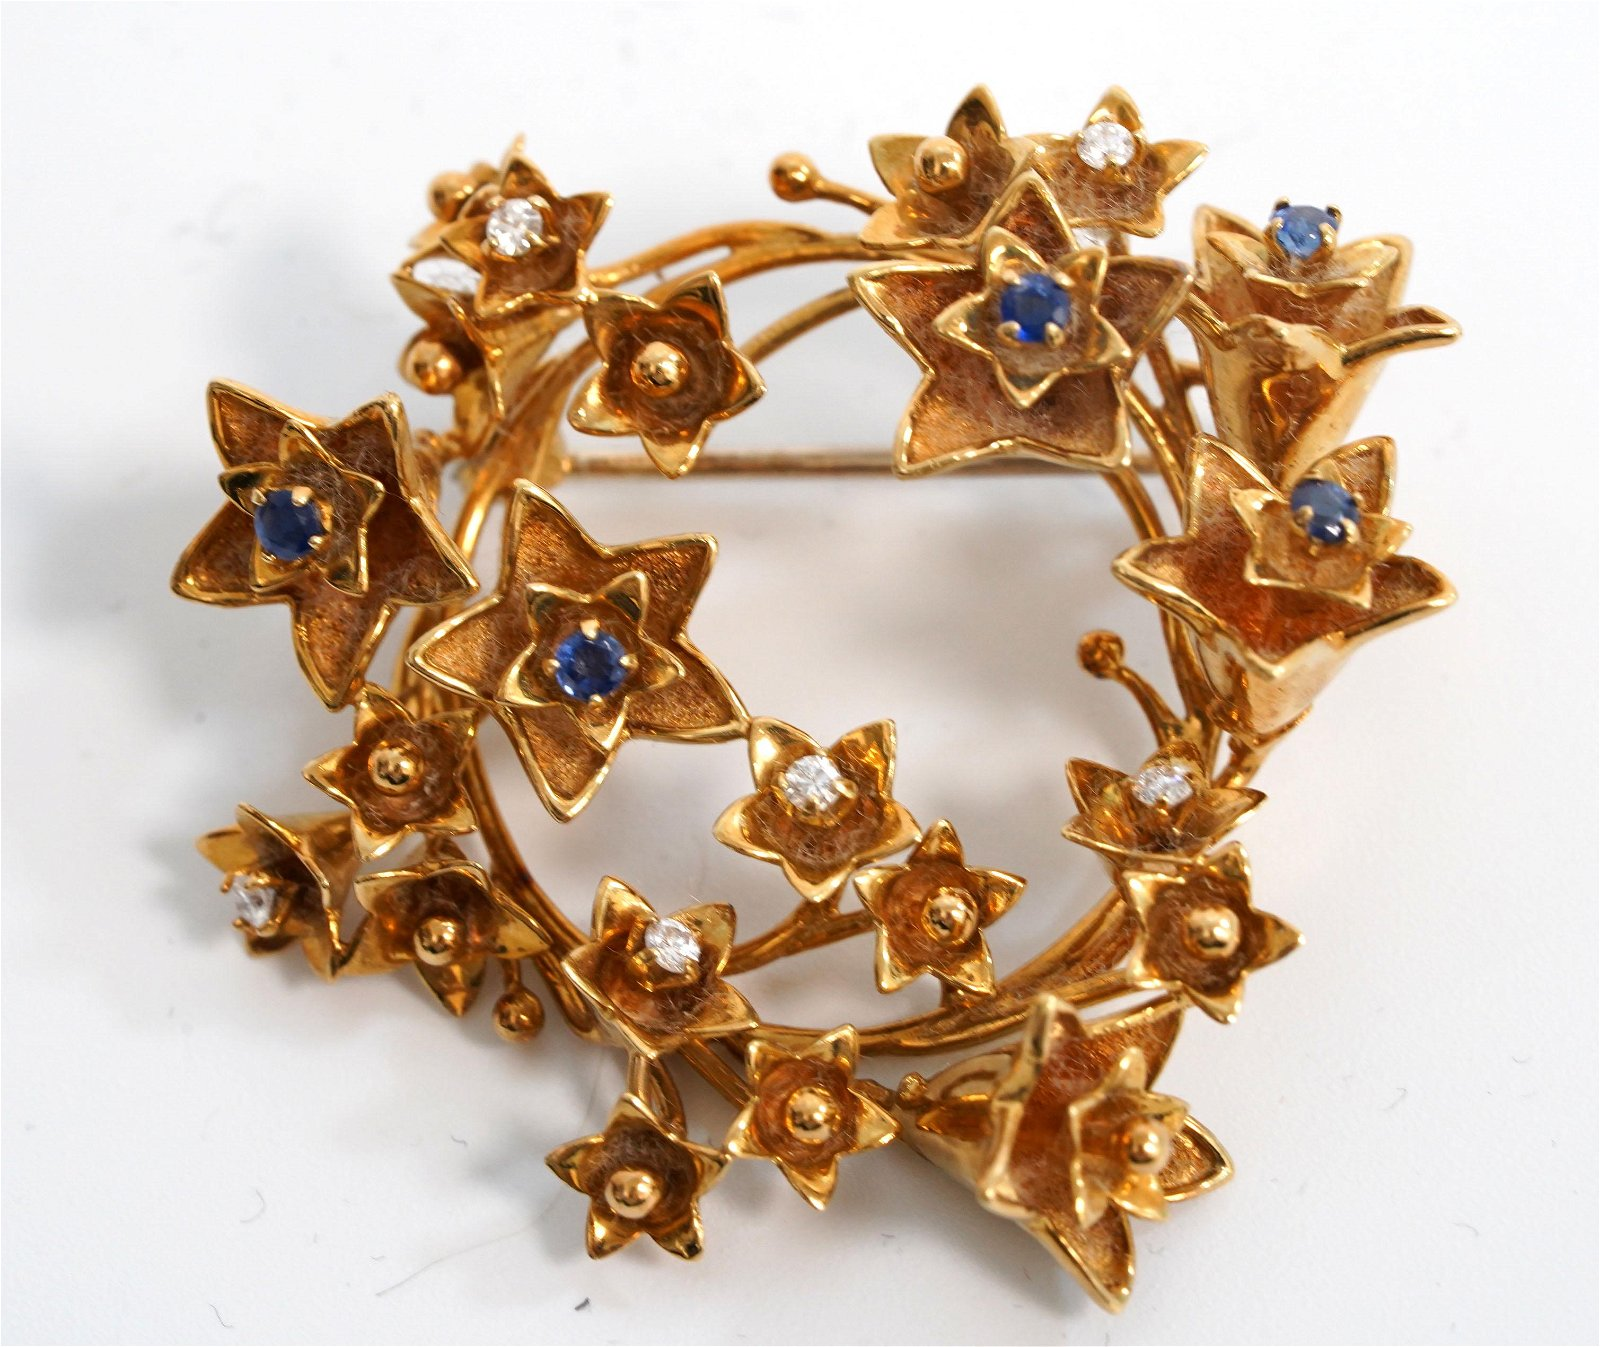 Vintage Tiffany & Co 18K Italian Gold Wreath Pin